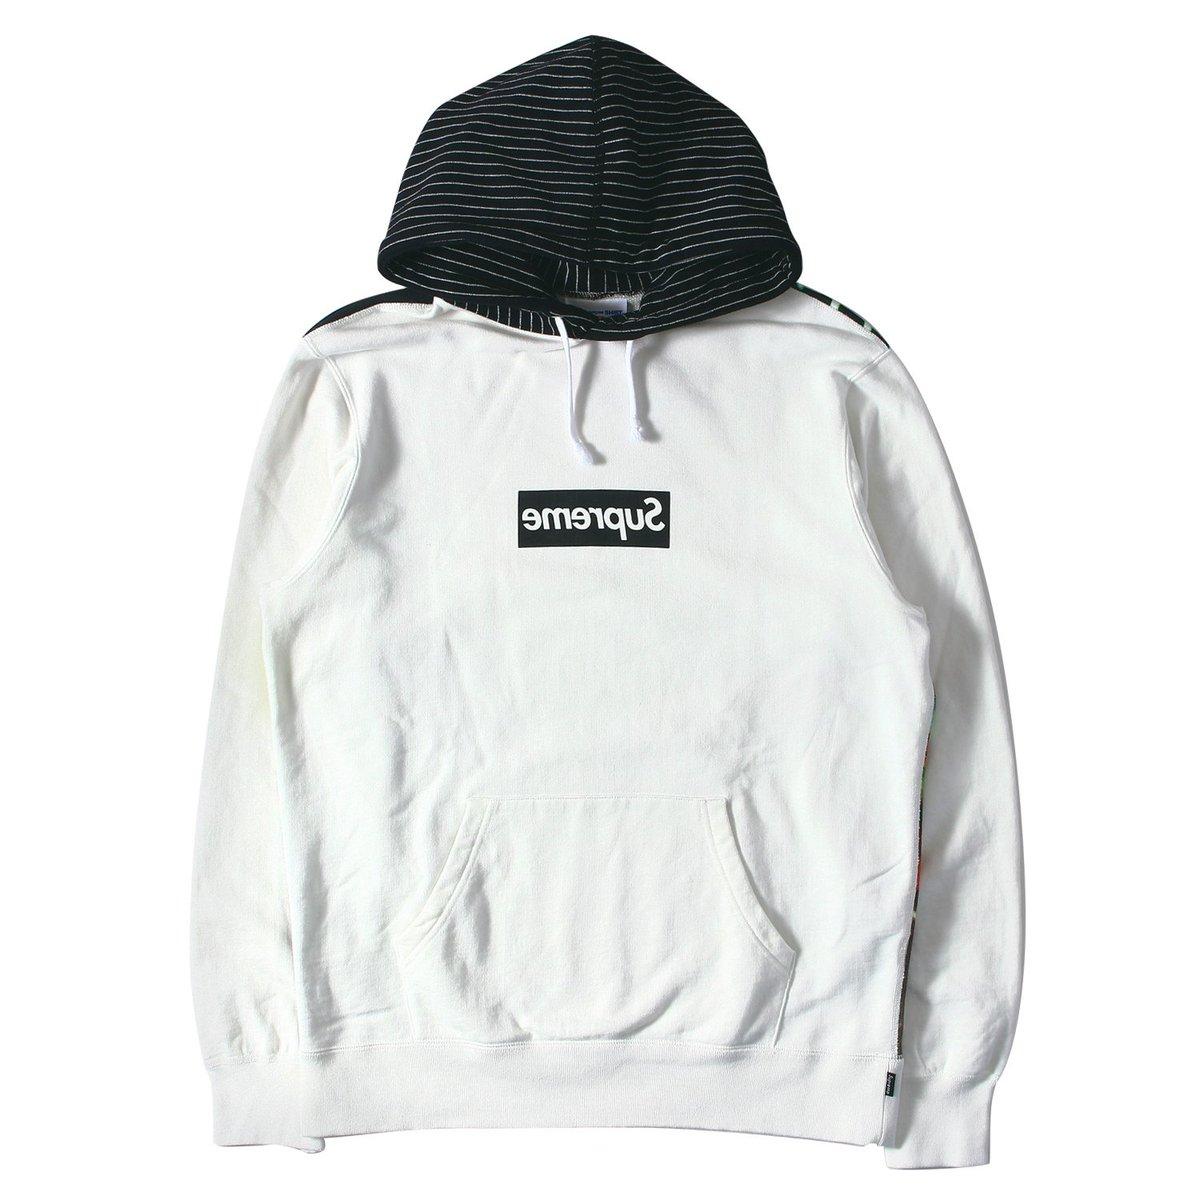 2f9b32c0fdf2 Supreme supreme comme des garcons harold hunter box logo hoodie XL ...